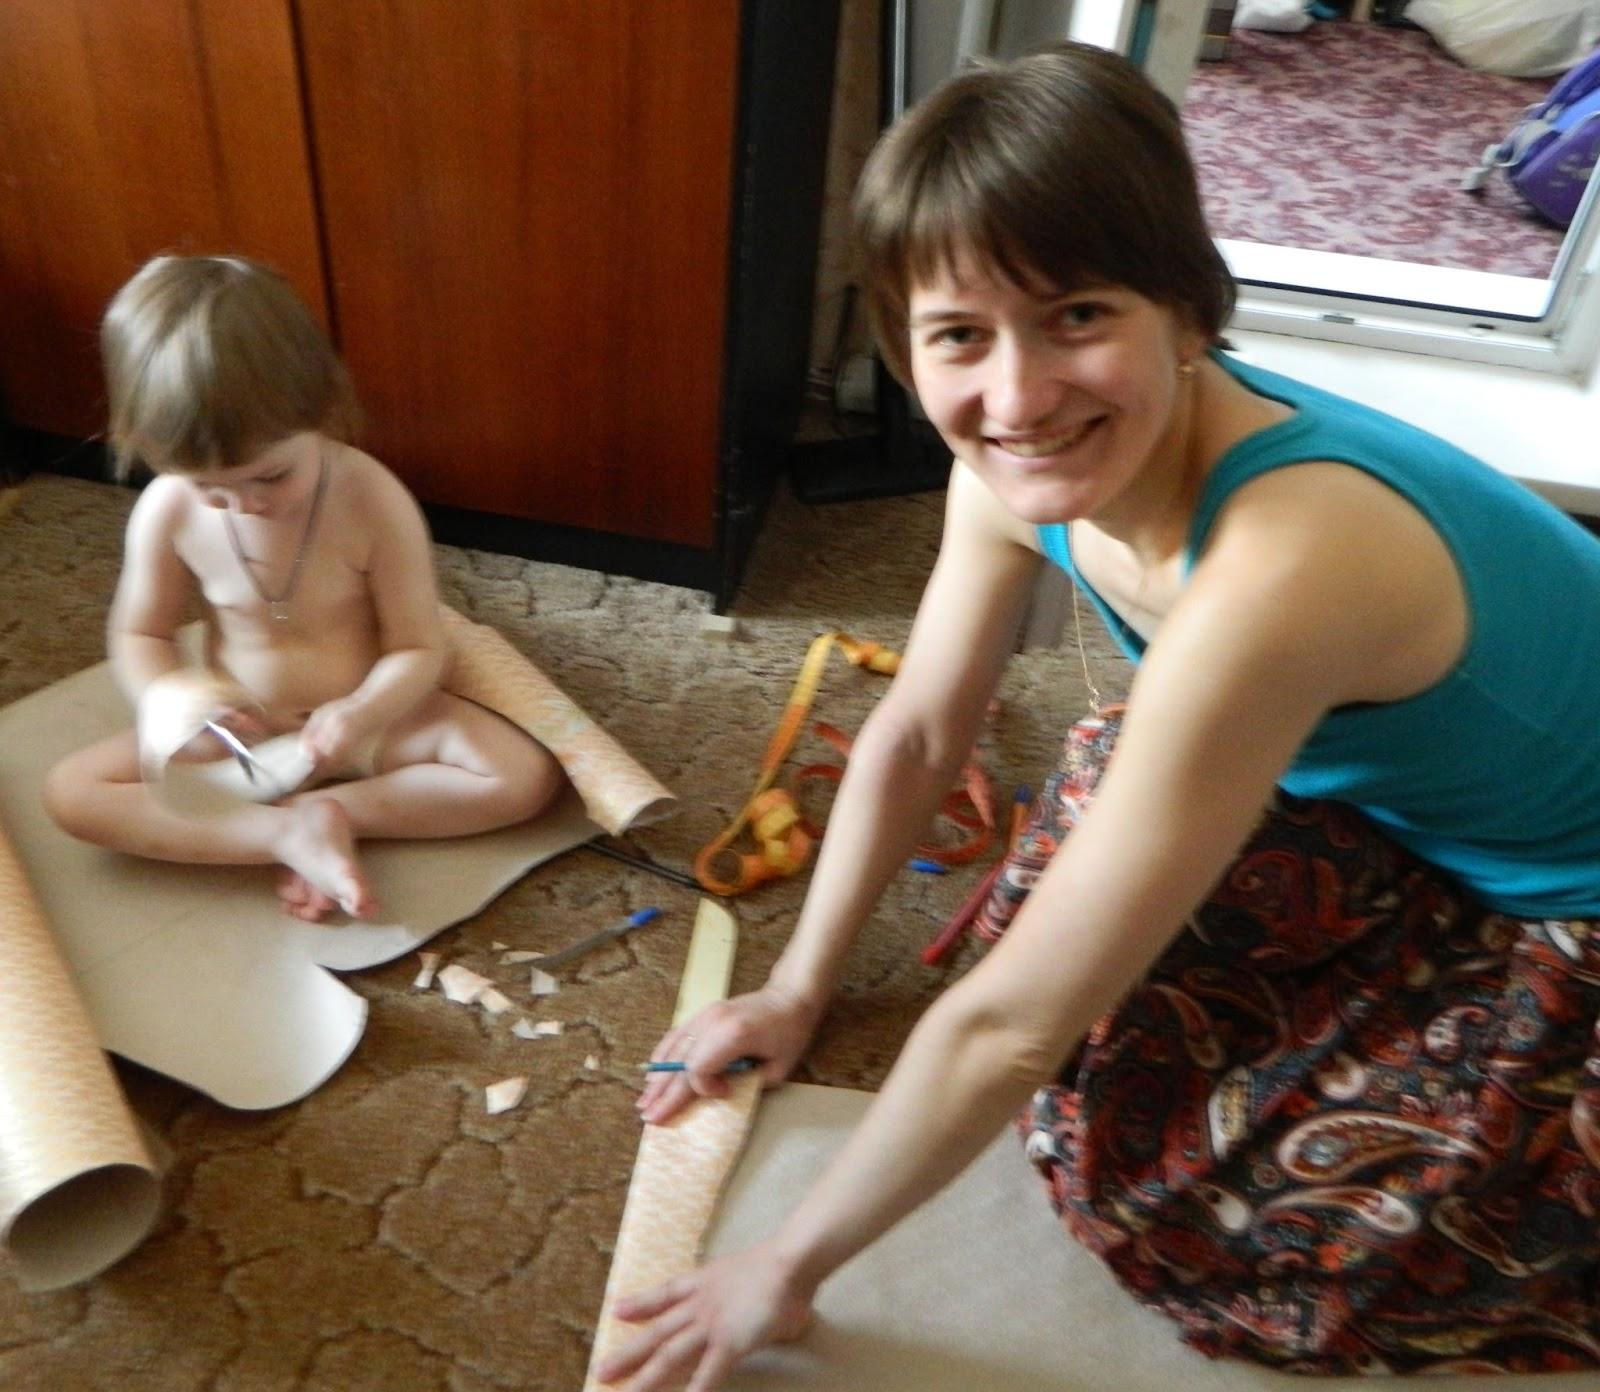 Секс под юбка руская мама исын